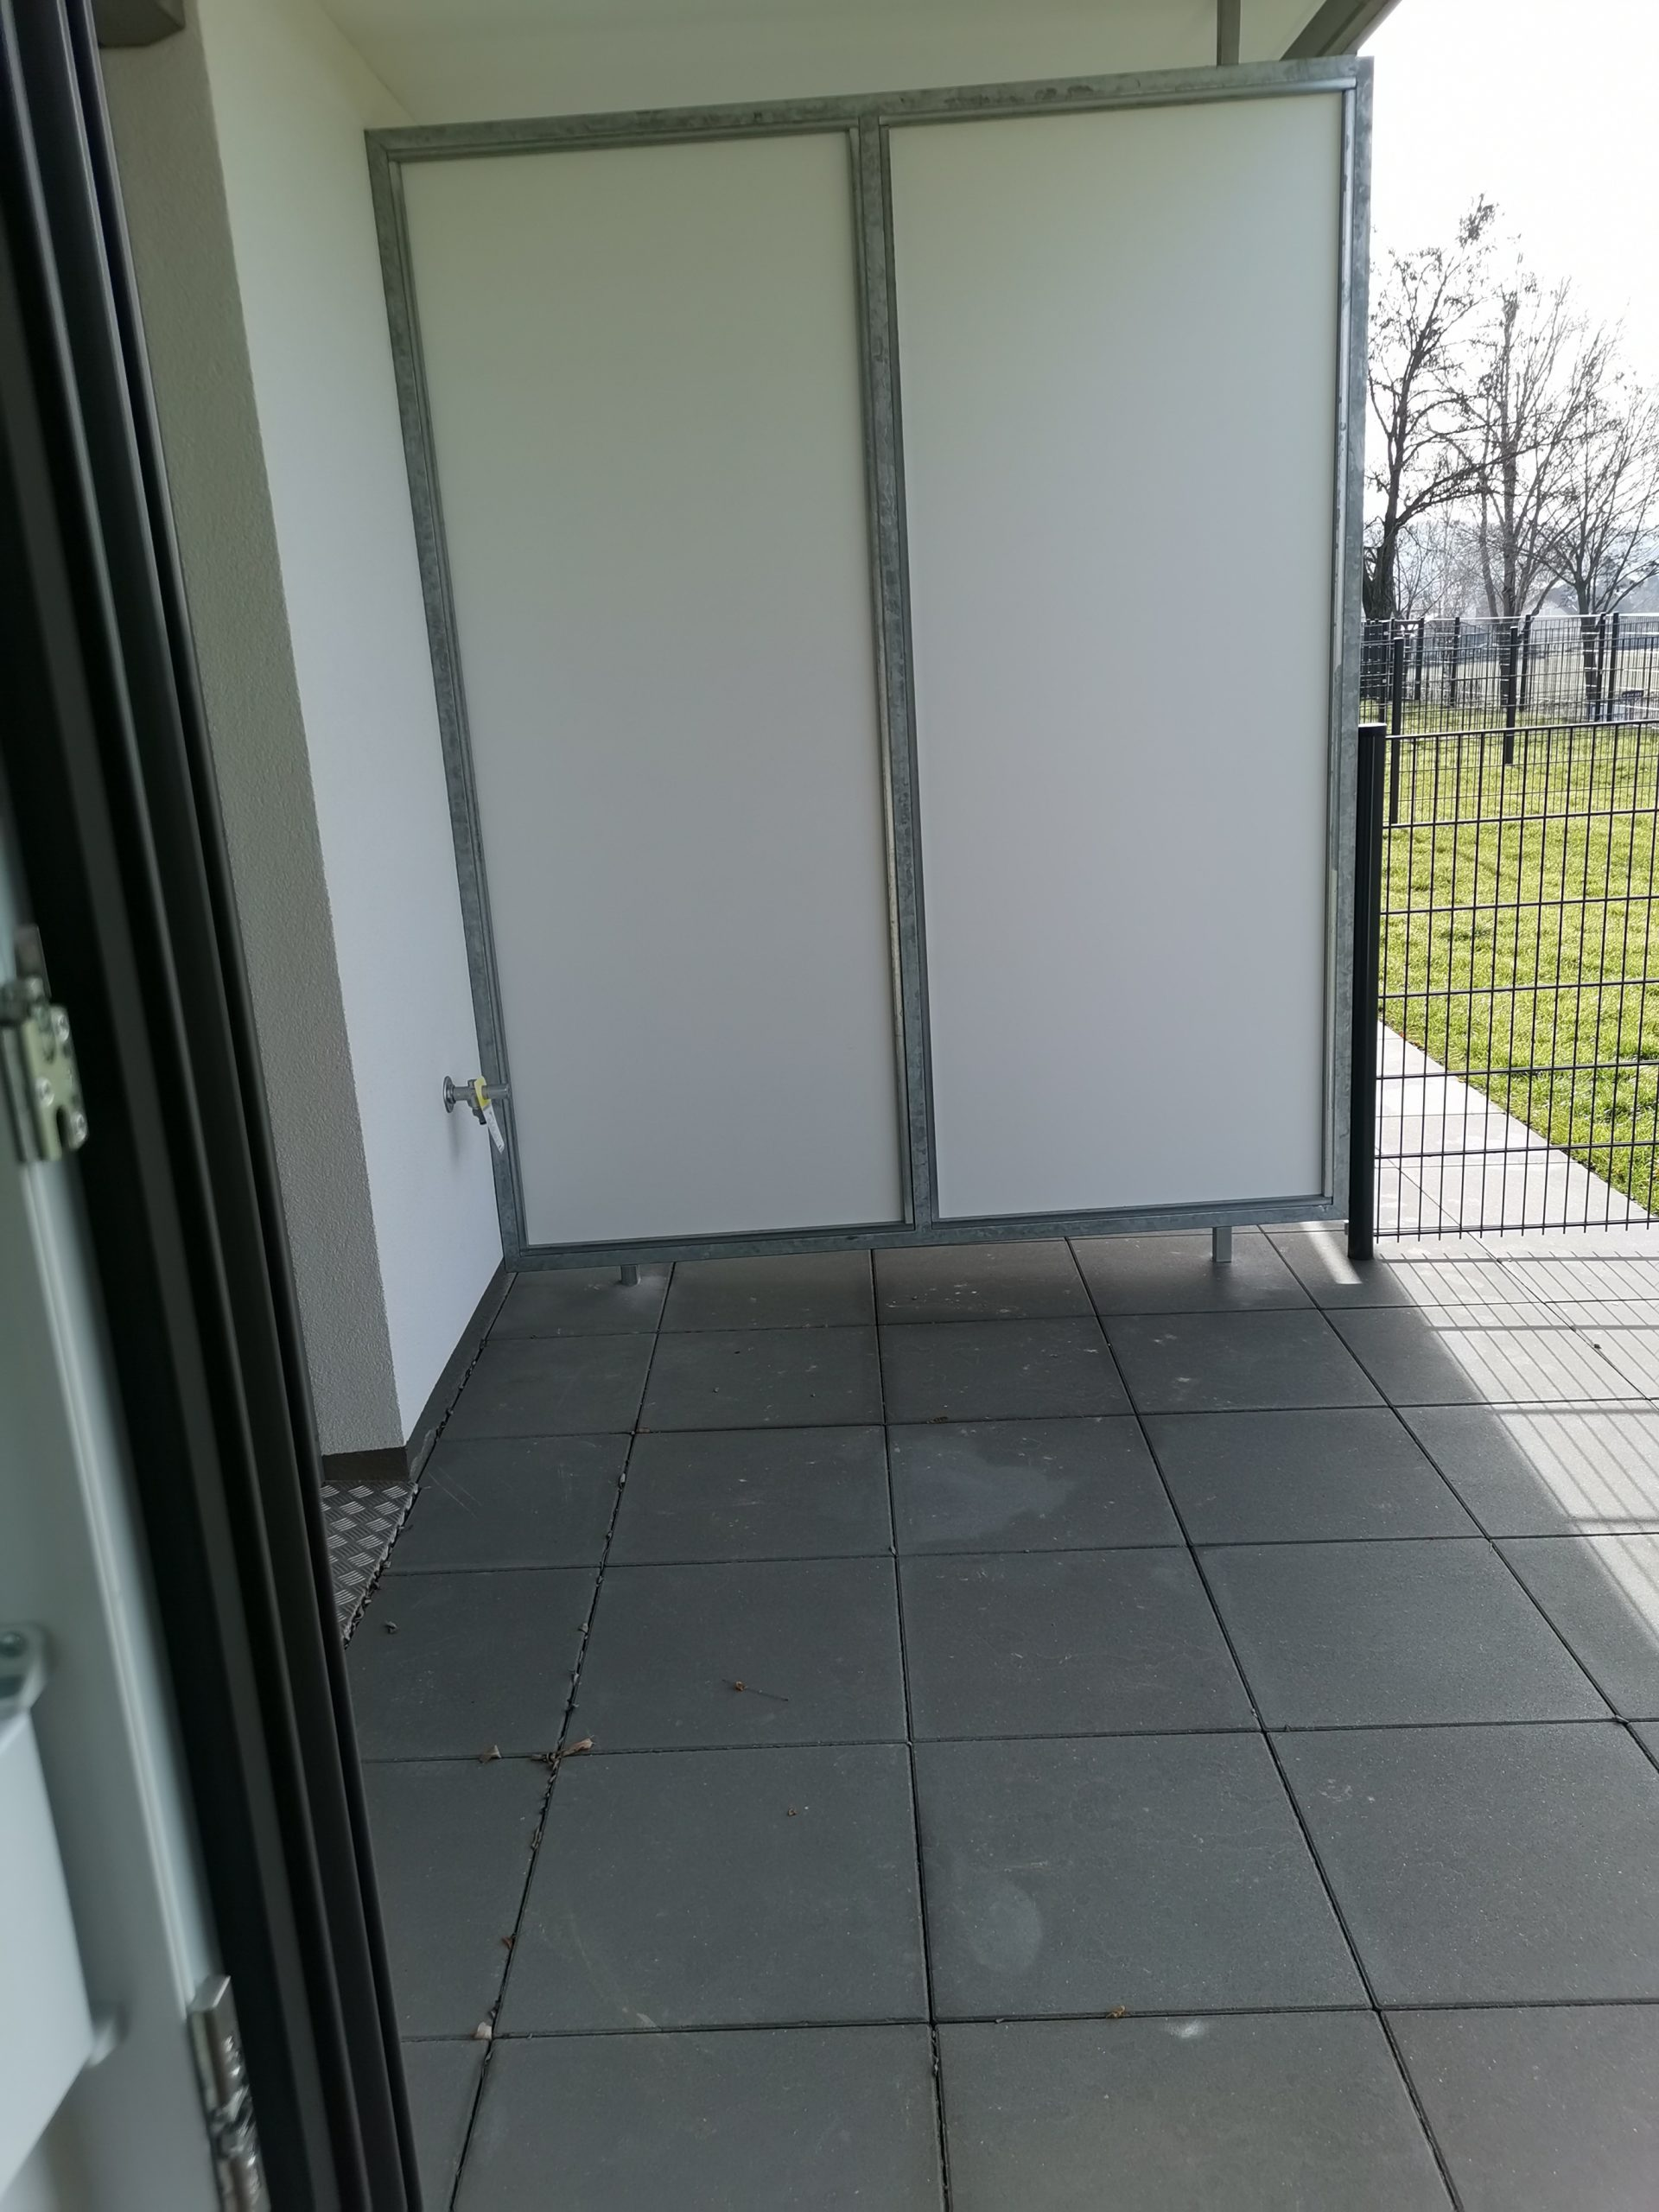 Immobilie von Kamptal in 3730 Eggenburg, Horn, Eggenburg VII - Top 203 #2